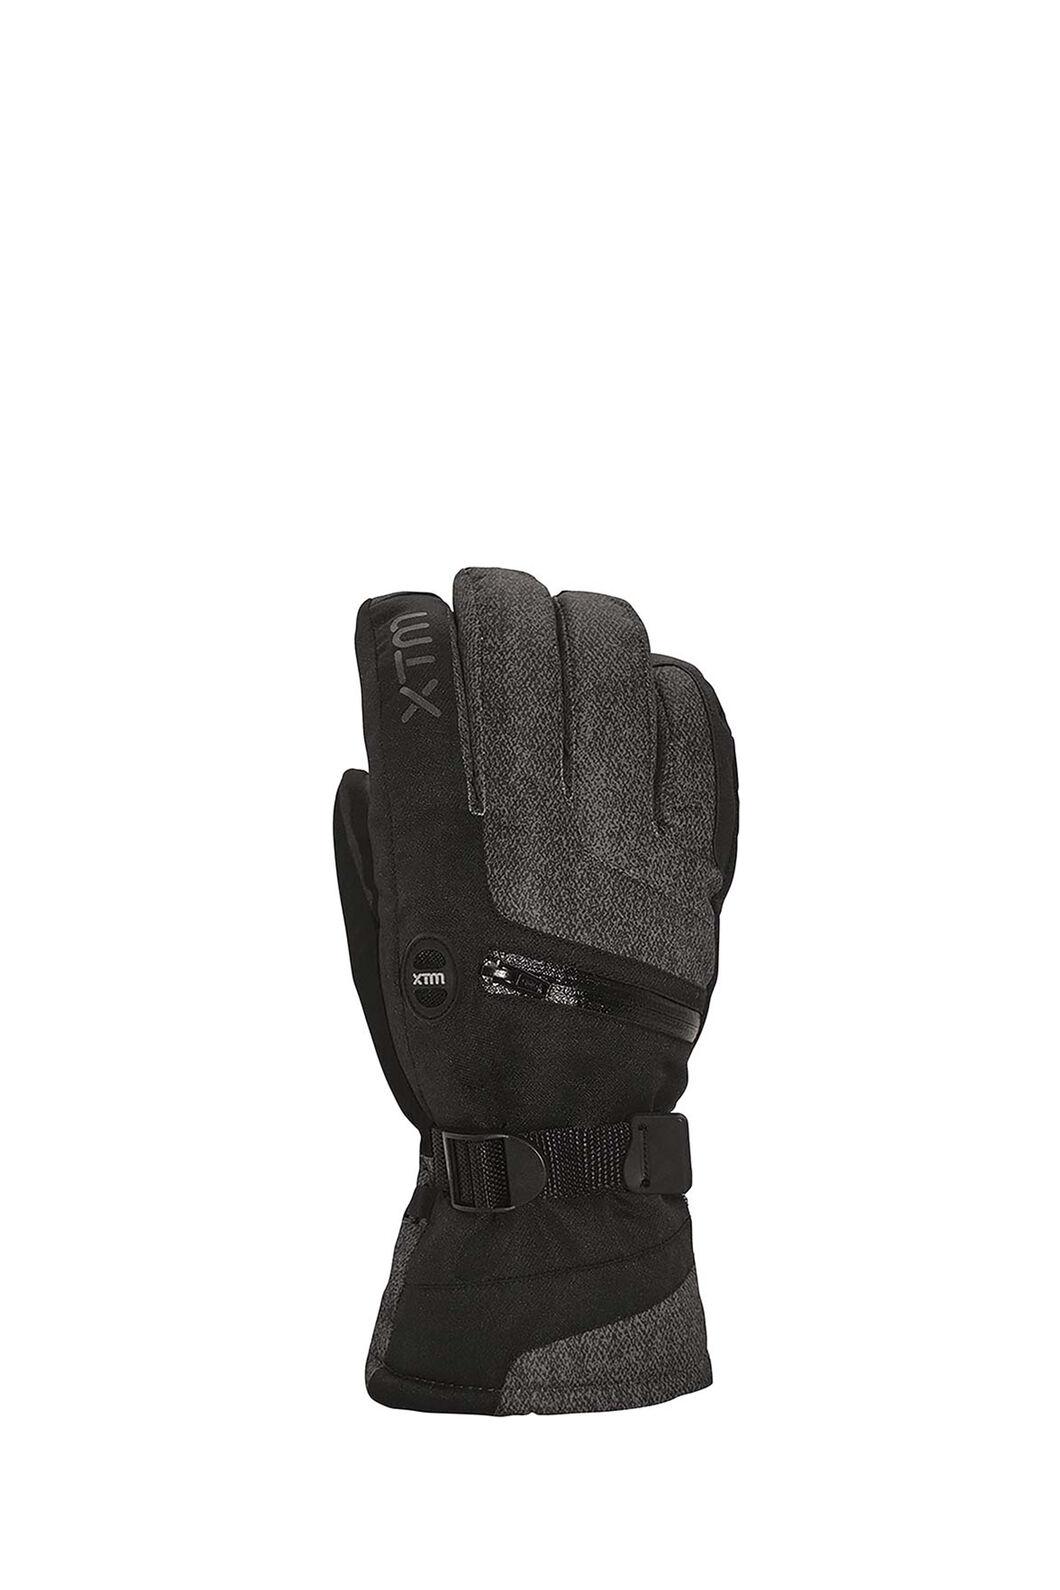 XTM Samurai Glove - Men's, BLACK MARLE, hi-res